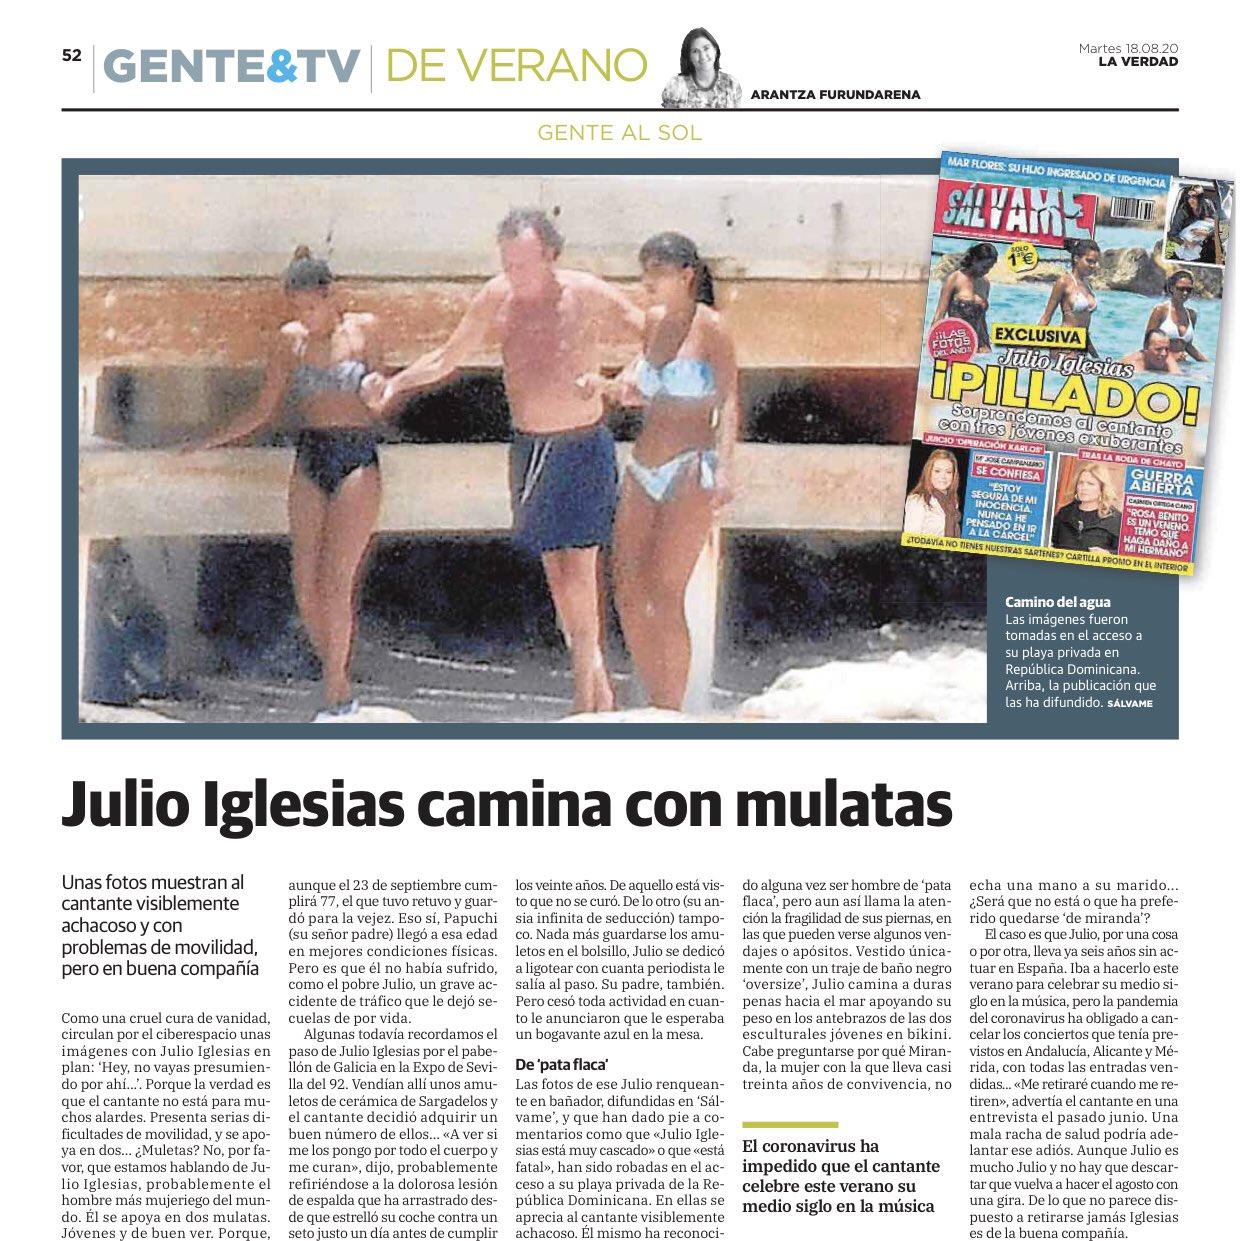 Julio Iglesias es rock and roll - Página 7 Efr0pkCX0AAOZ-t?format=jpg&name=large